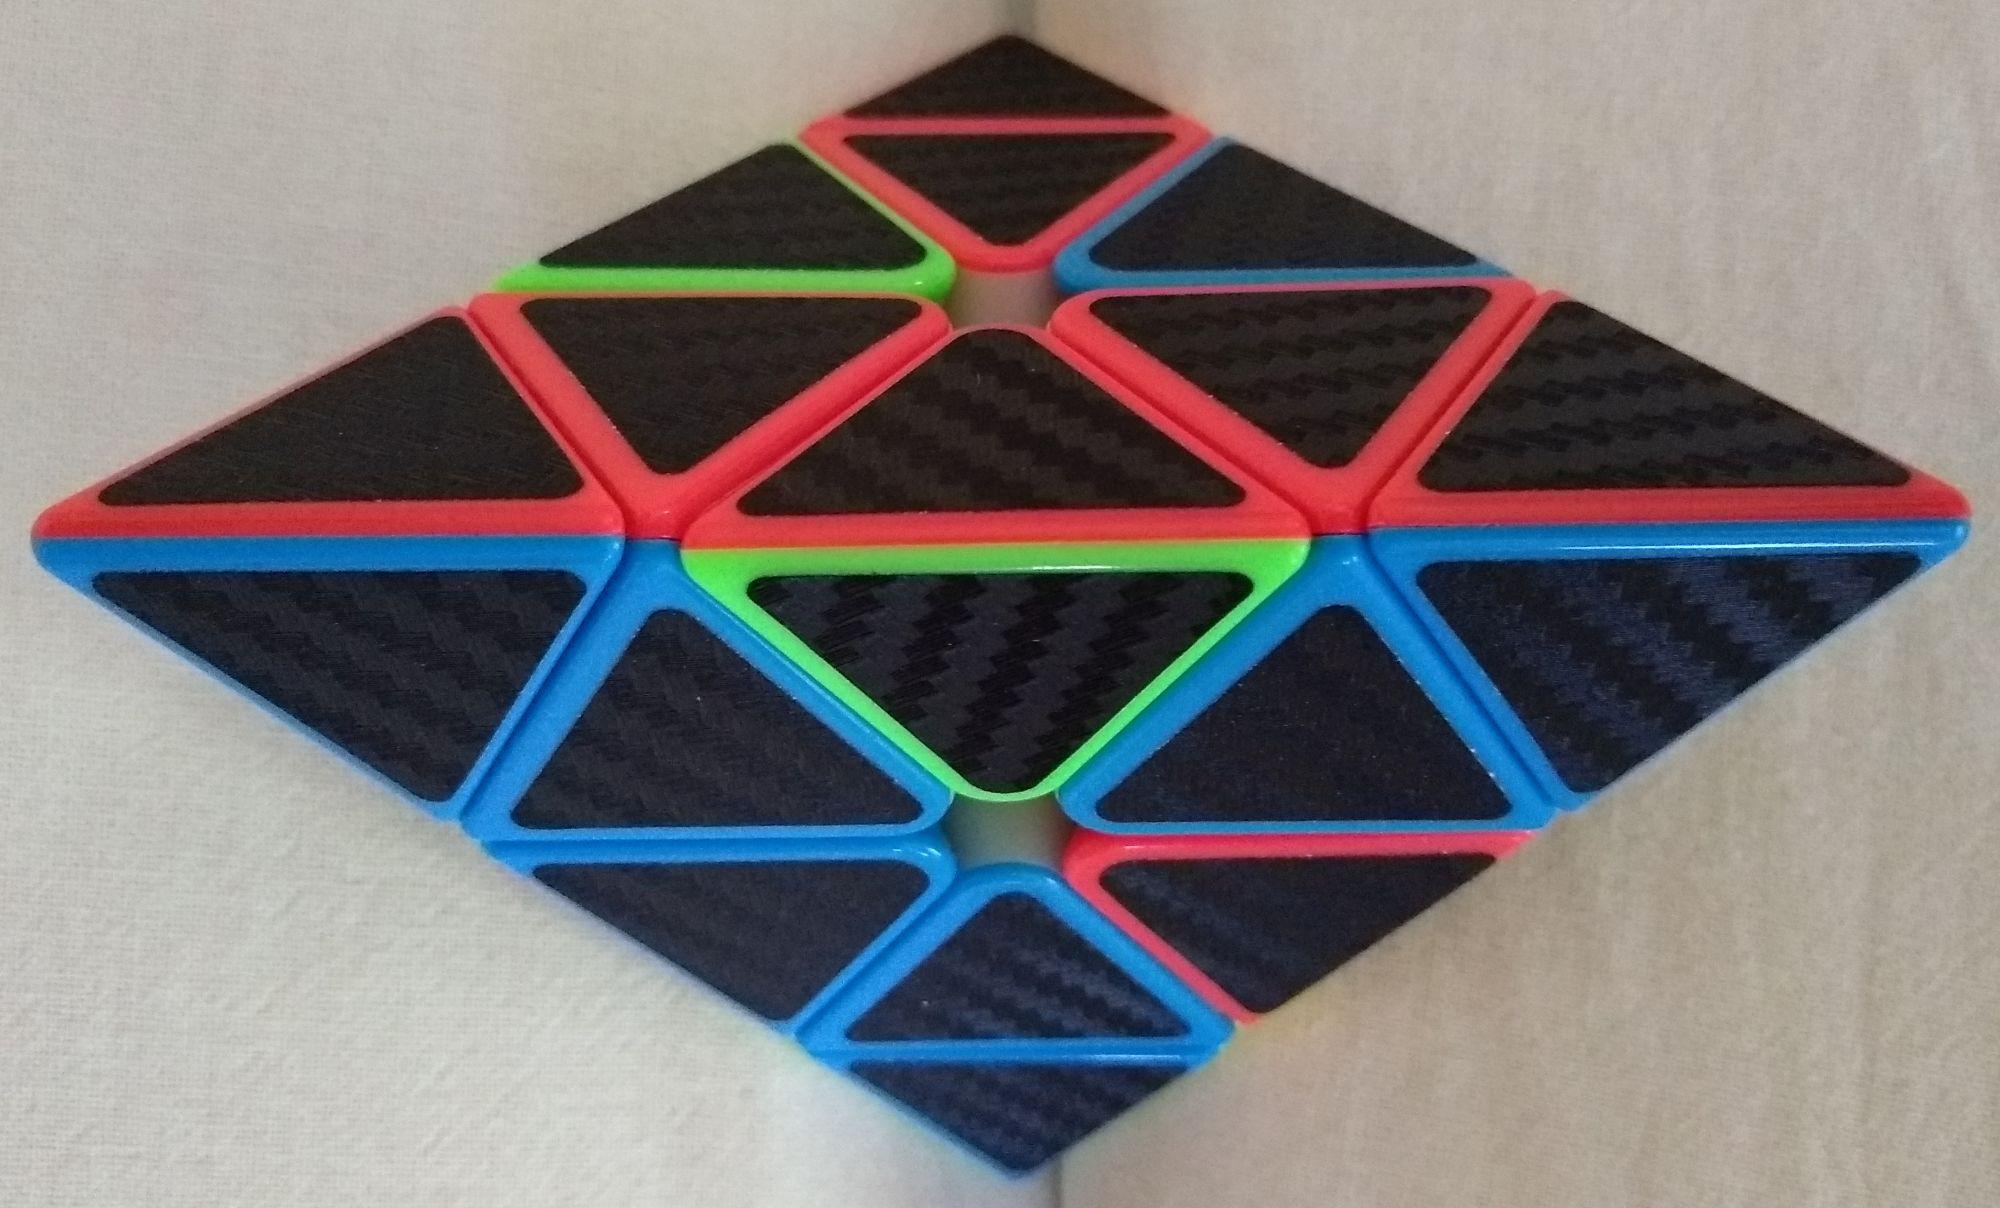 Mismatching edge pair in bottom layer